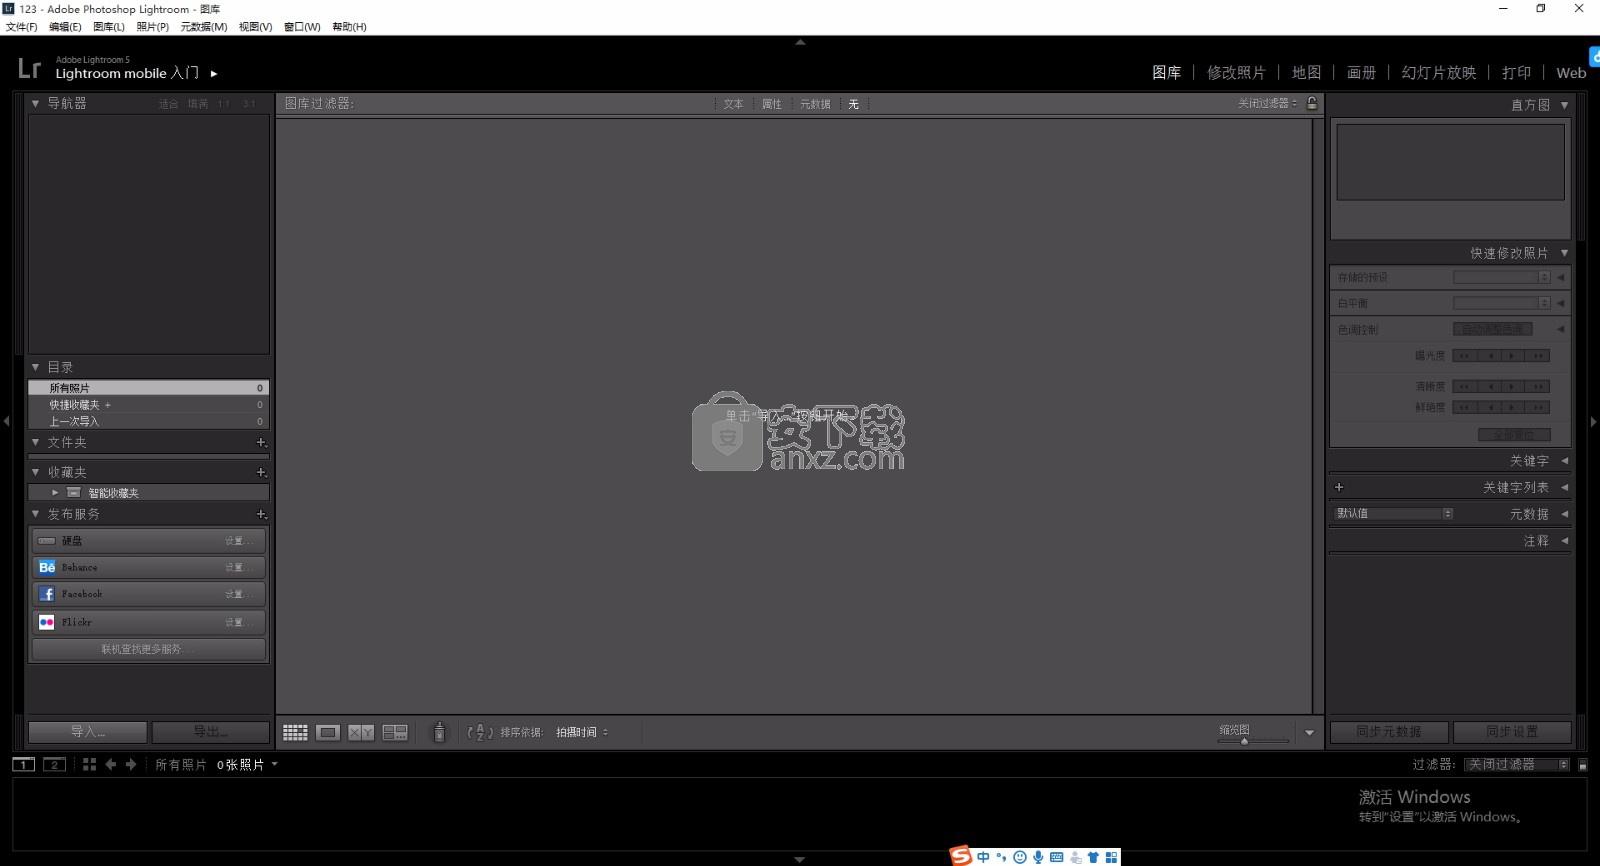 Adobe Photoshop Lightroom(图像处理工具)